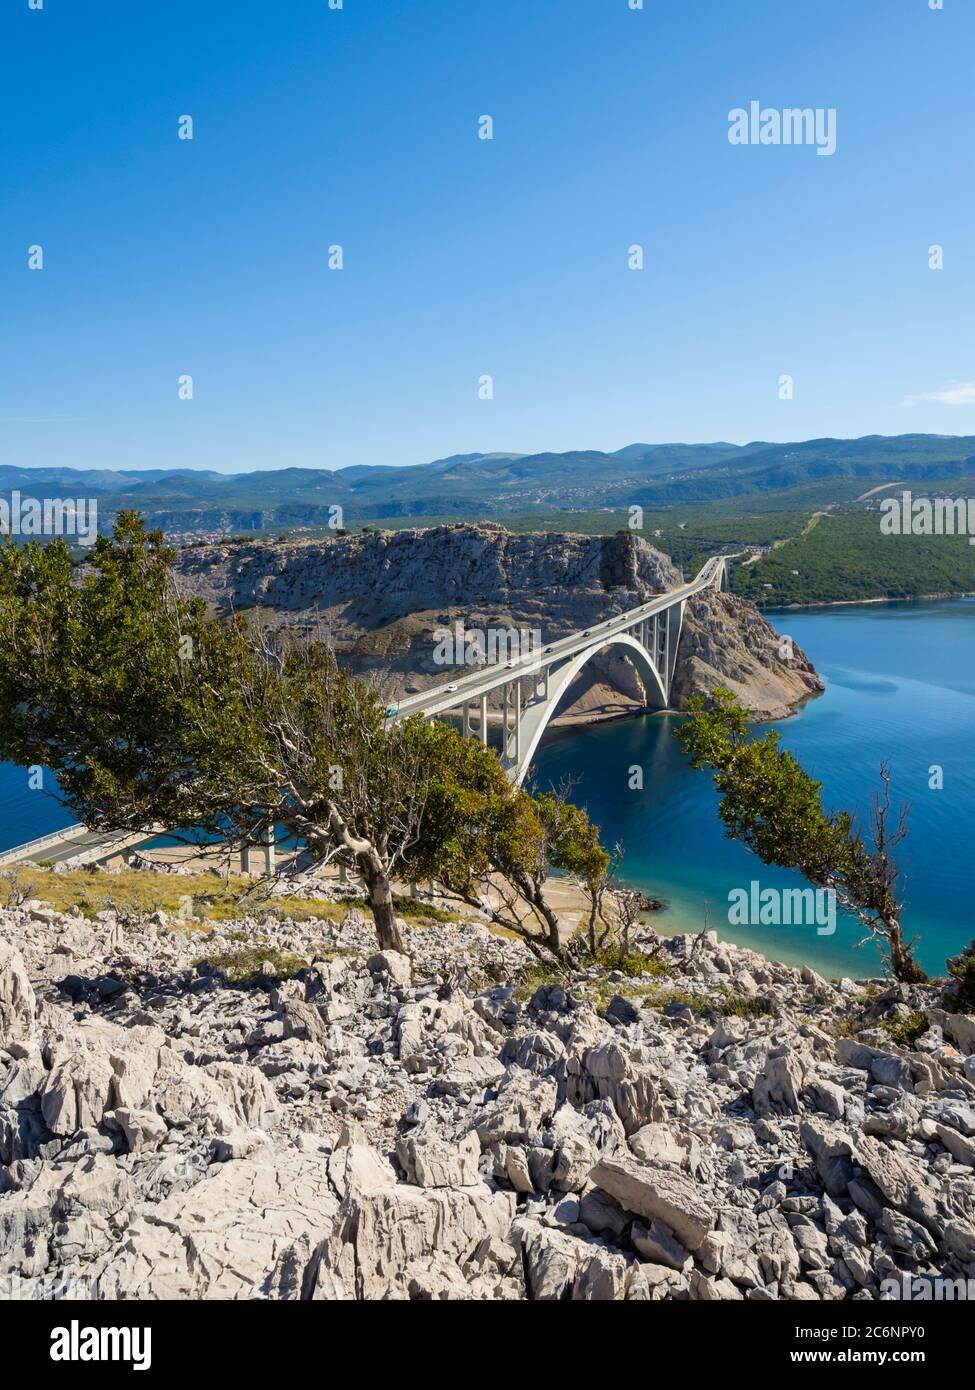 Bridge mainland to Krk island in Croatia Europe Stock Photo